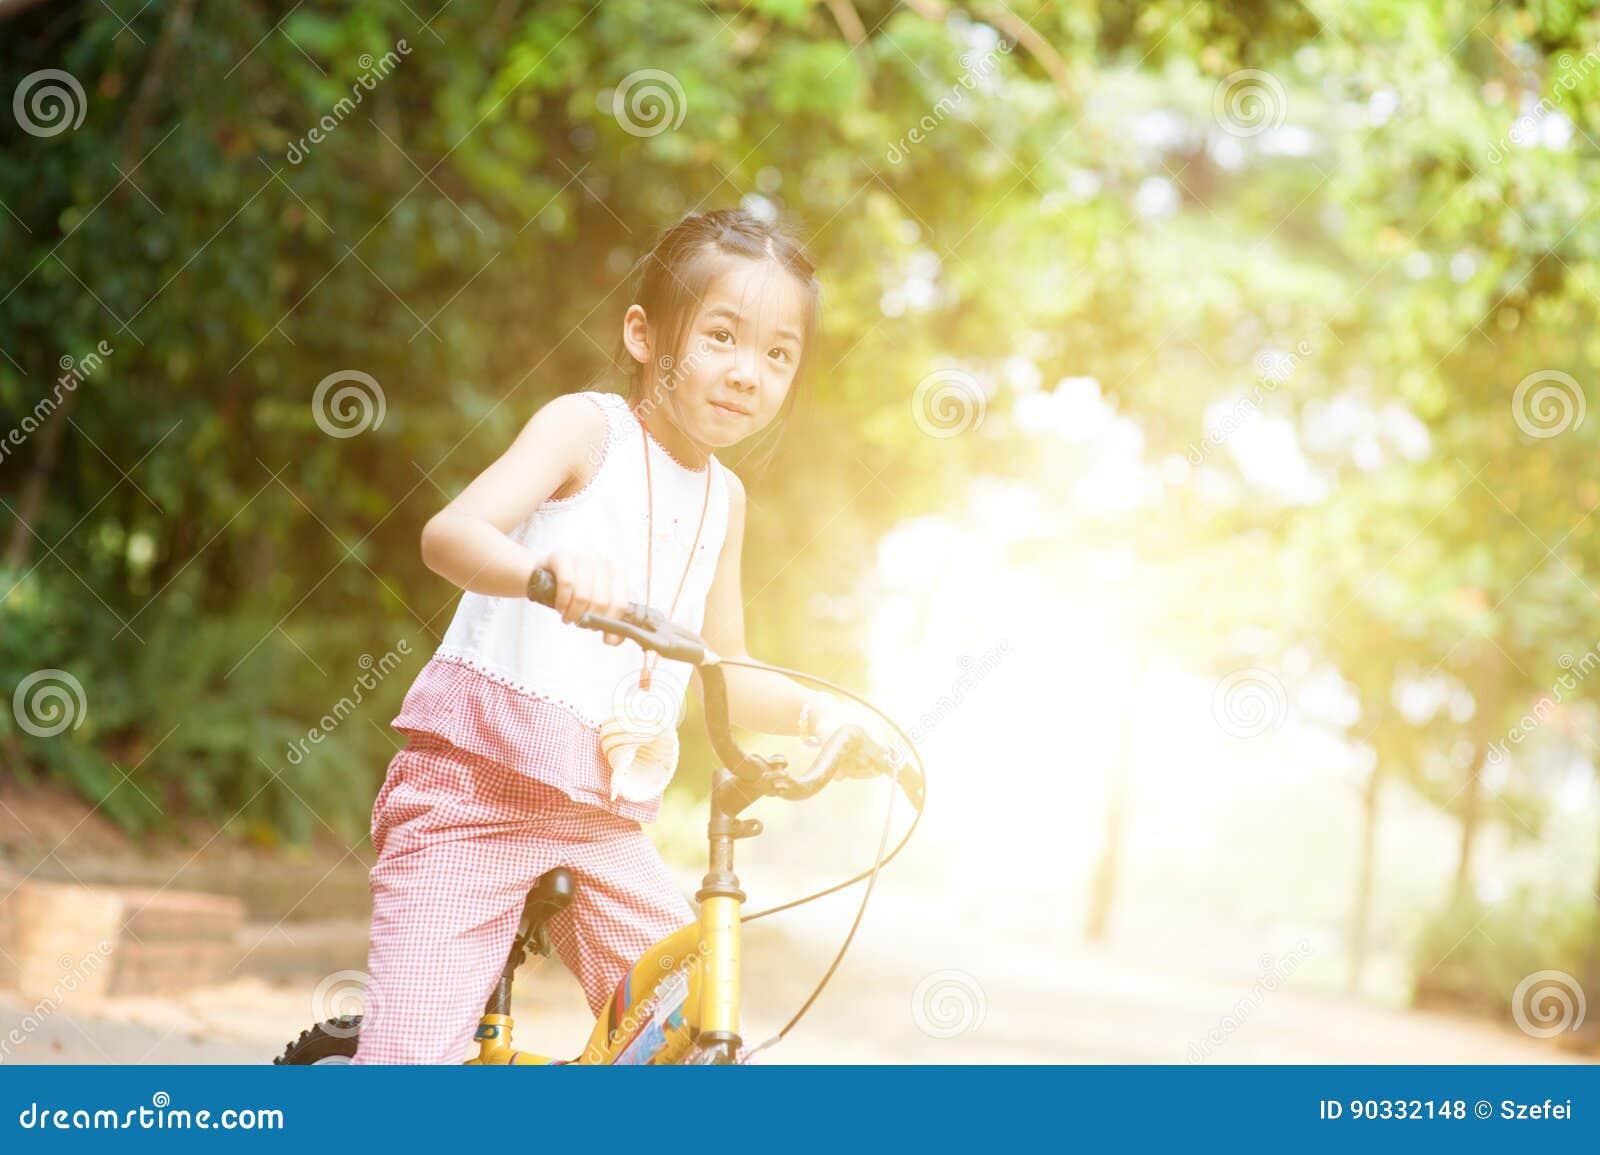 Bicicleta asiática del montar a caballo del niño al aire libre